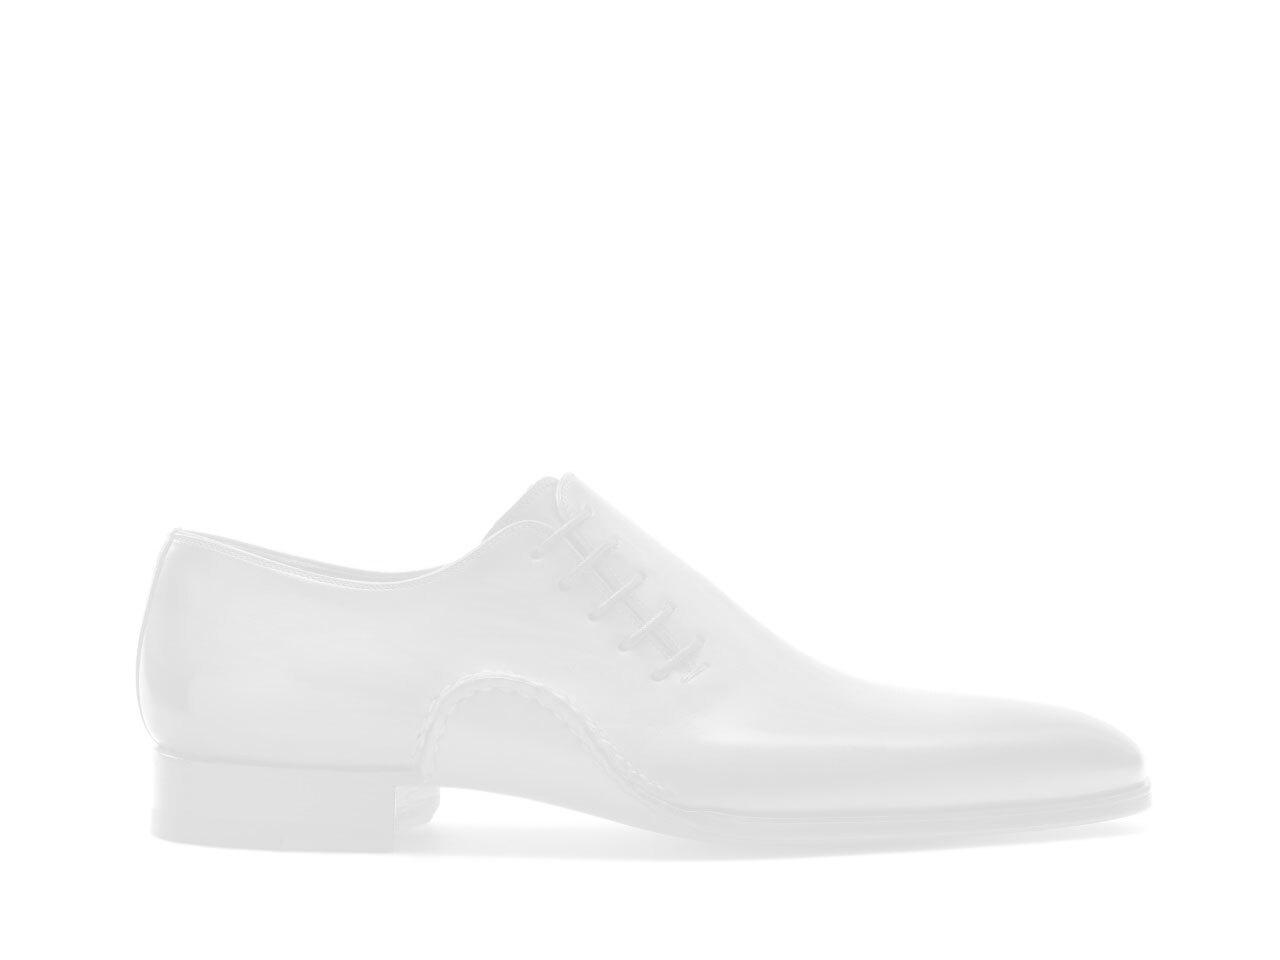 Pair of the Magnanni Isaac Cognac Men's Double Monk Strap Shoes